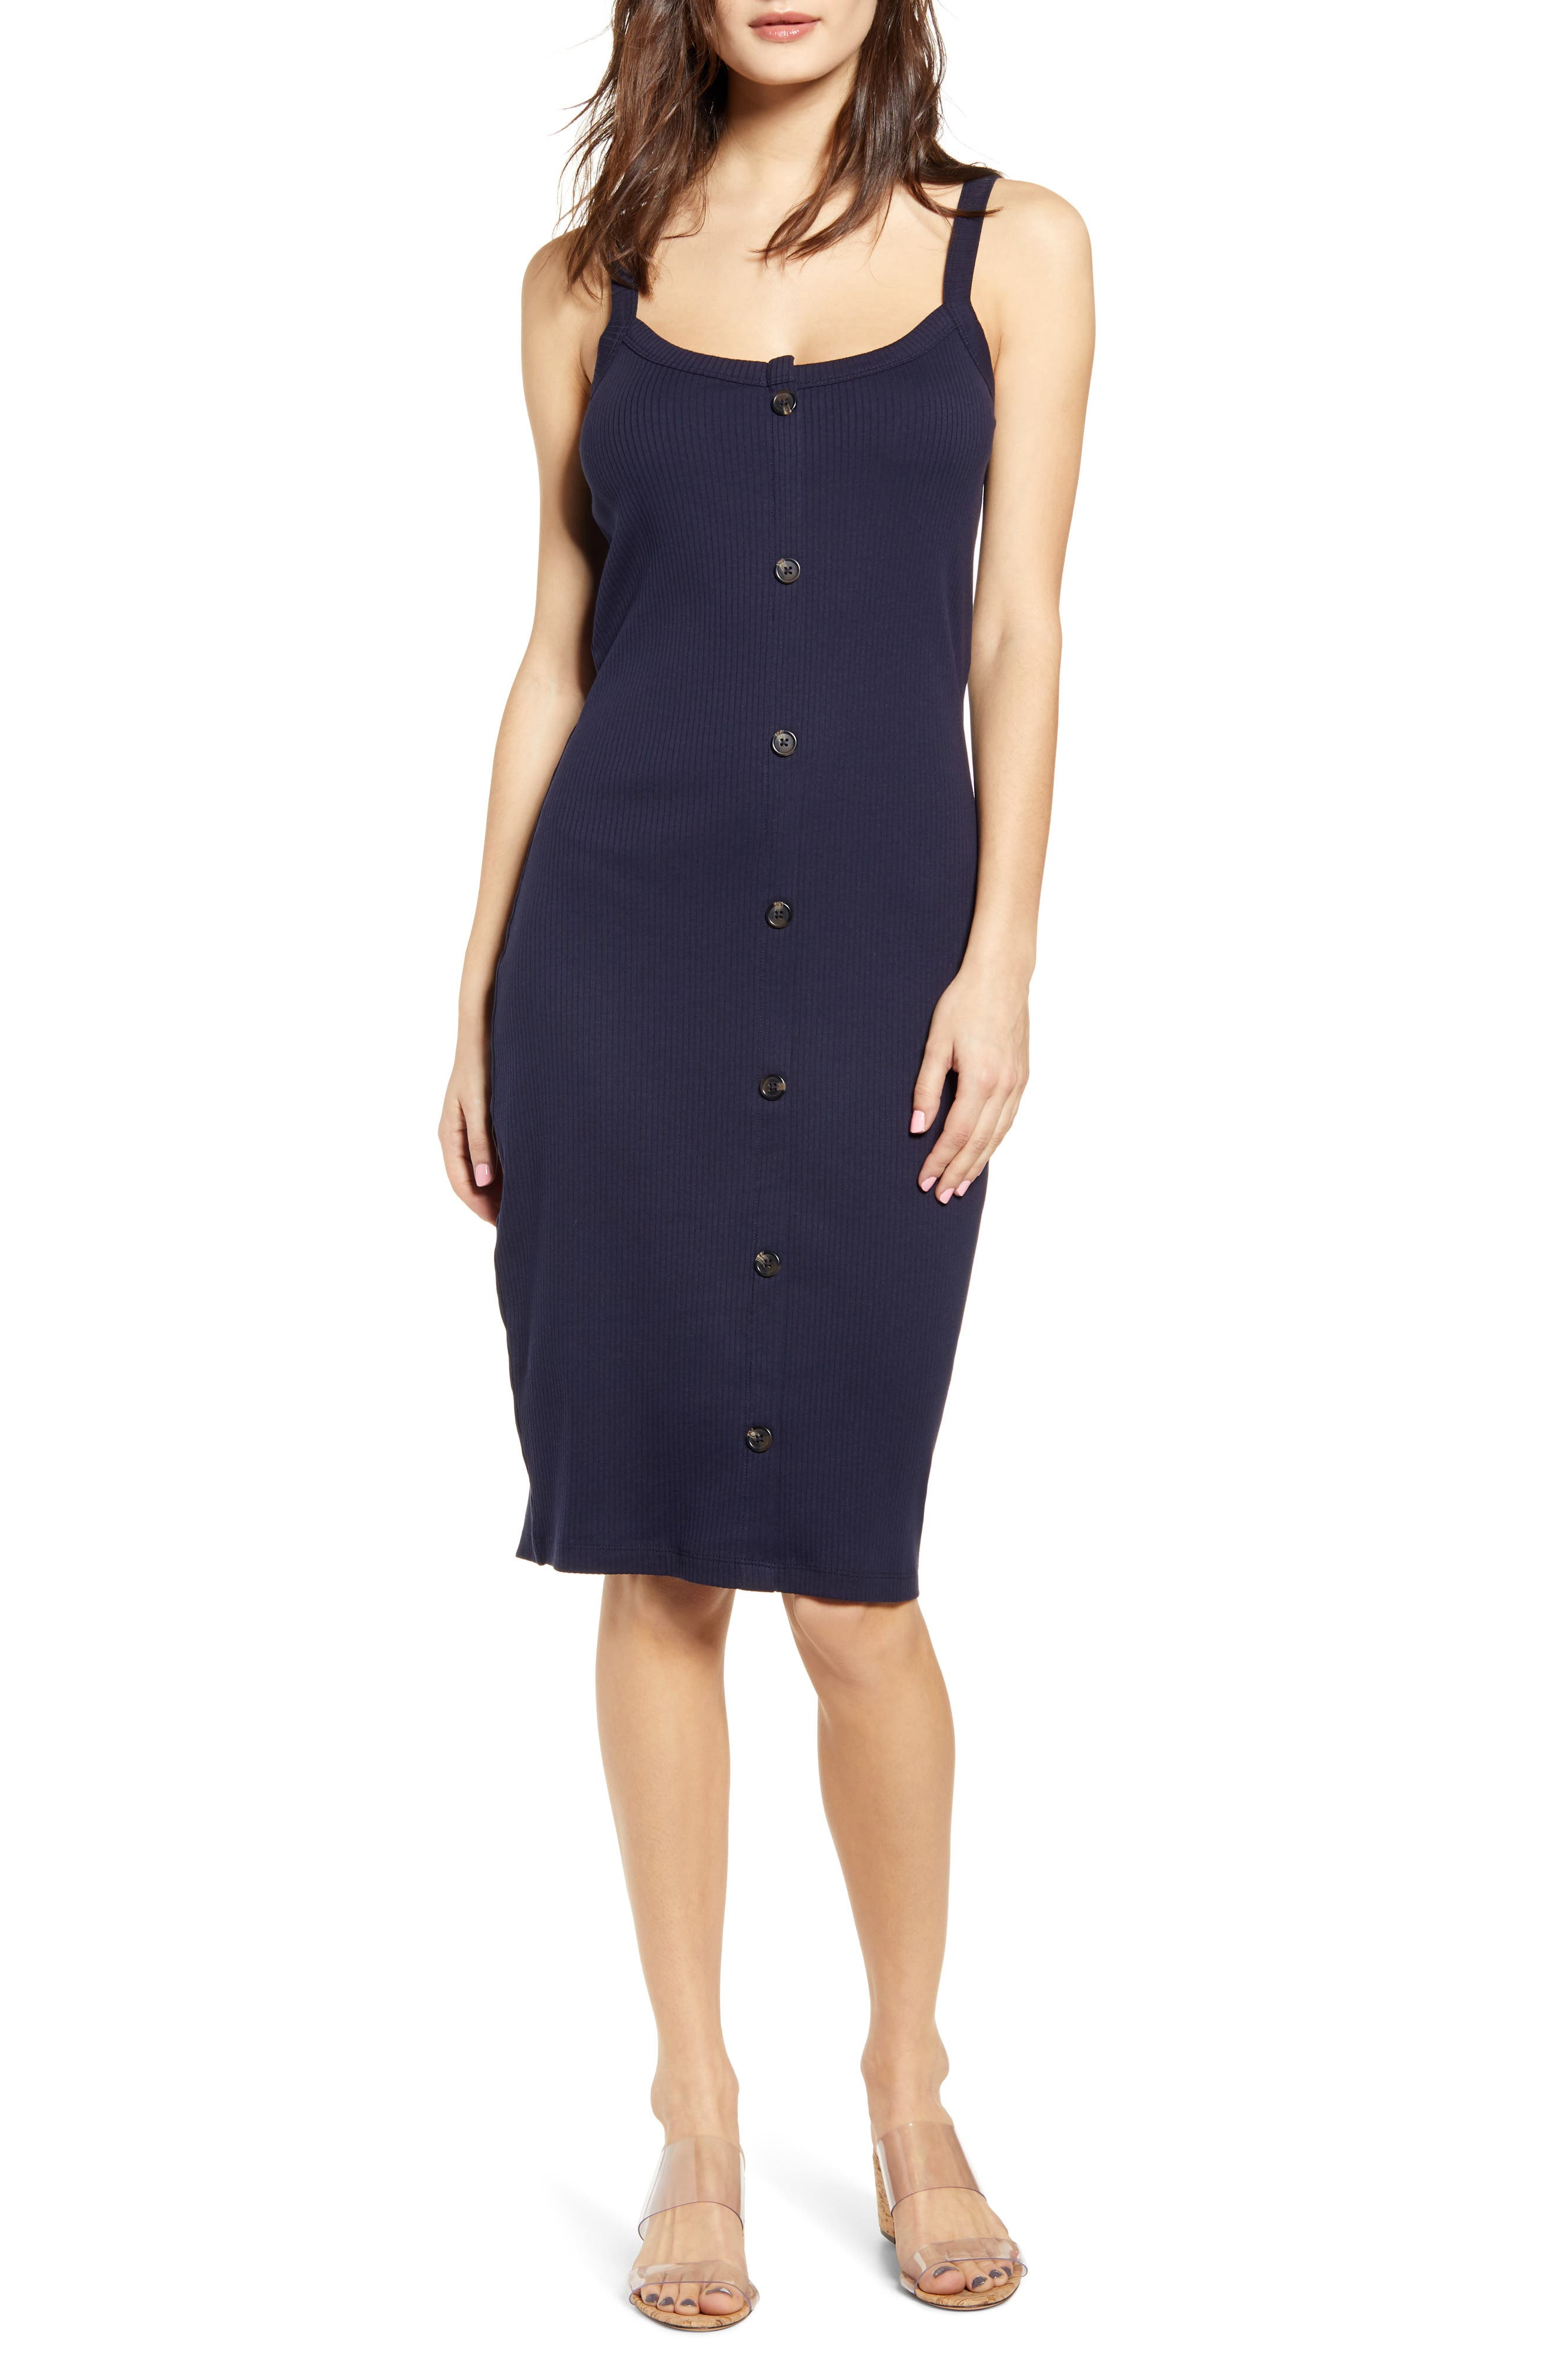 Vero Moda Helsinki Ribbed Dress, Blue